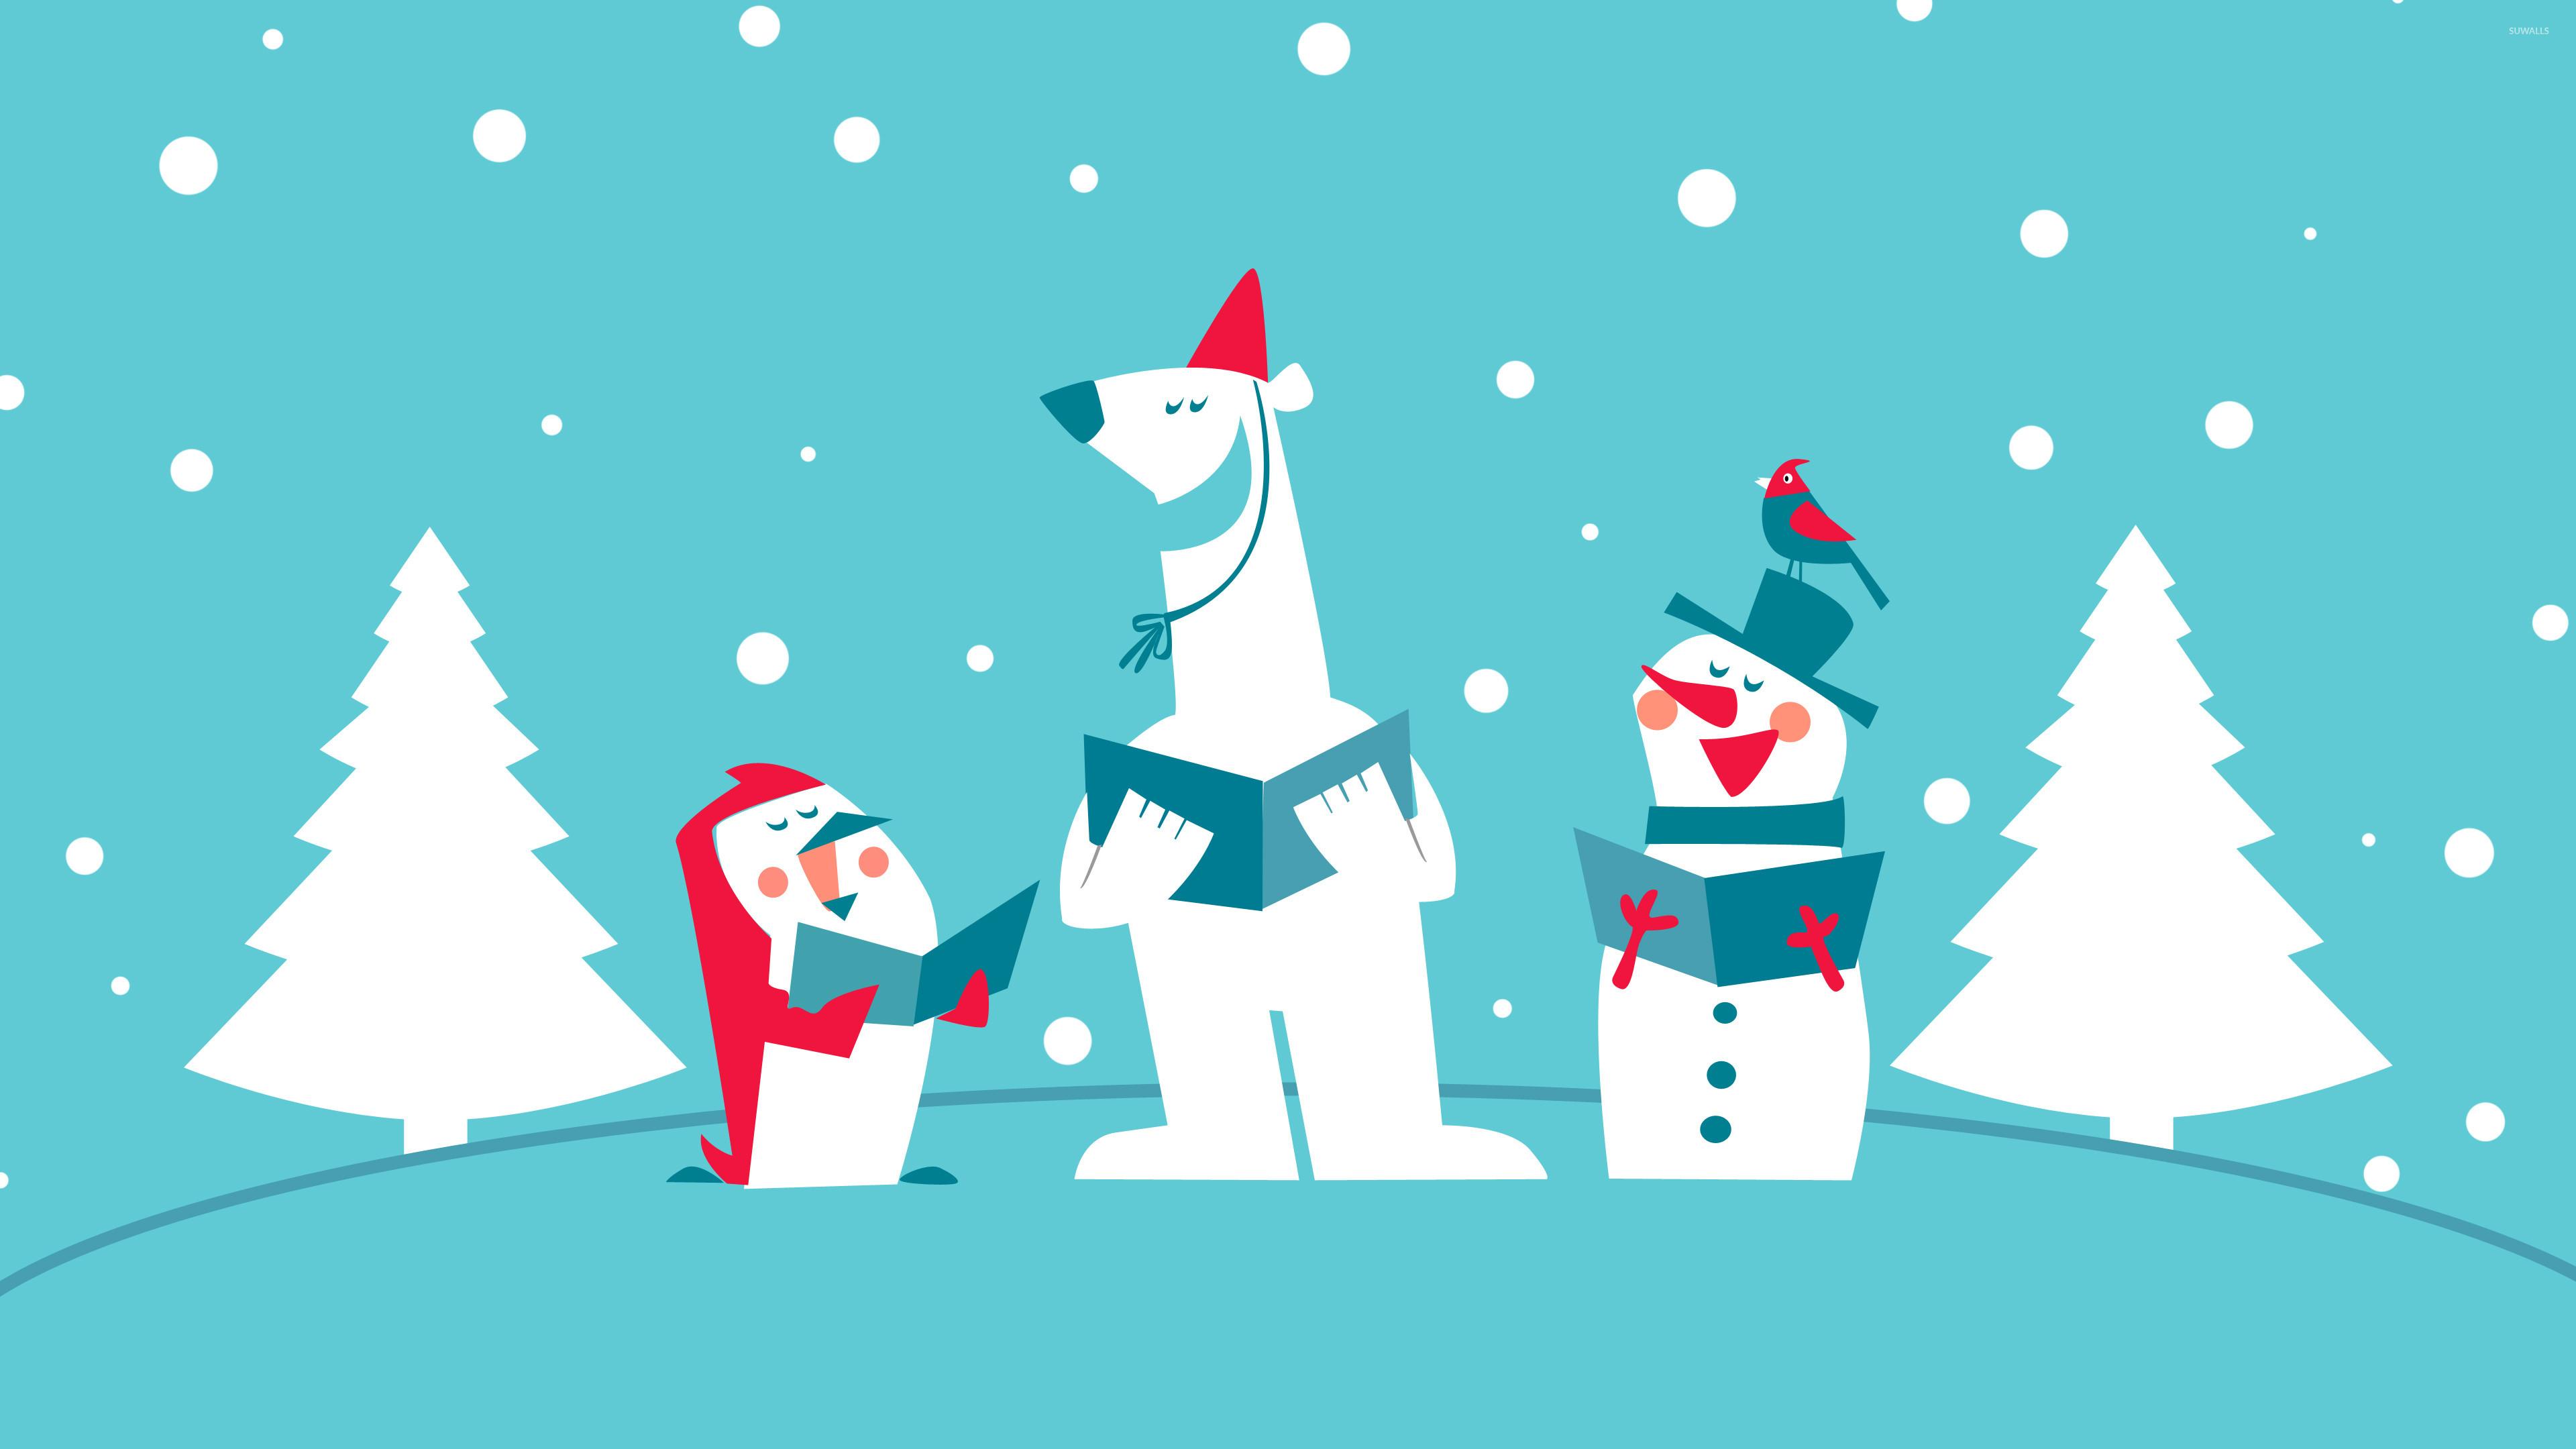 funny - Funny Christmas Wallpaper